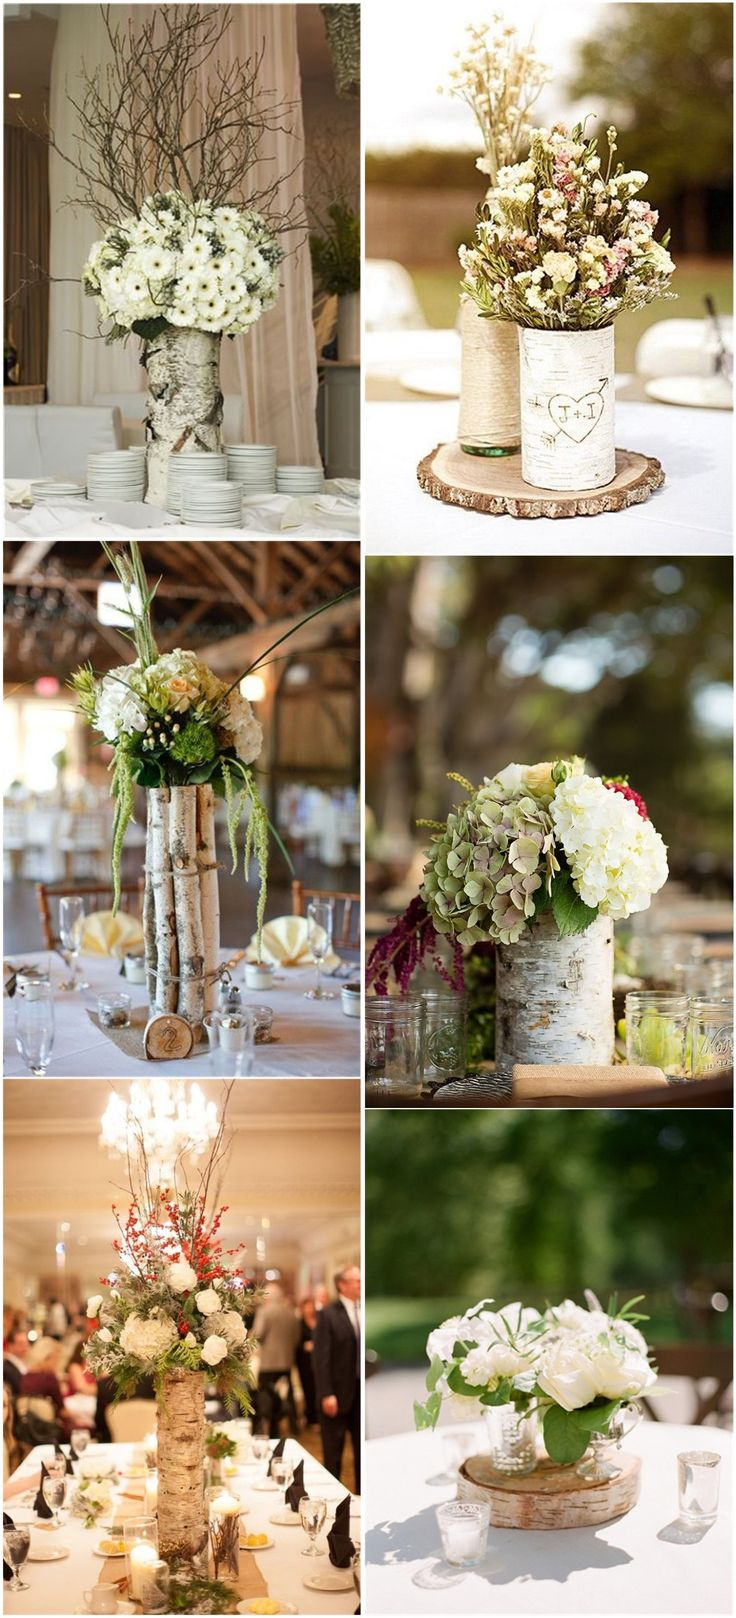 51 best wedding decoration images on pinterest weddings decor wedding centerpieces 26 ideas to rock your winter wedding with birch centerpieces junglespirit Choice Image